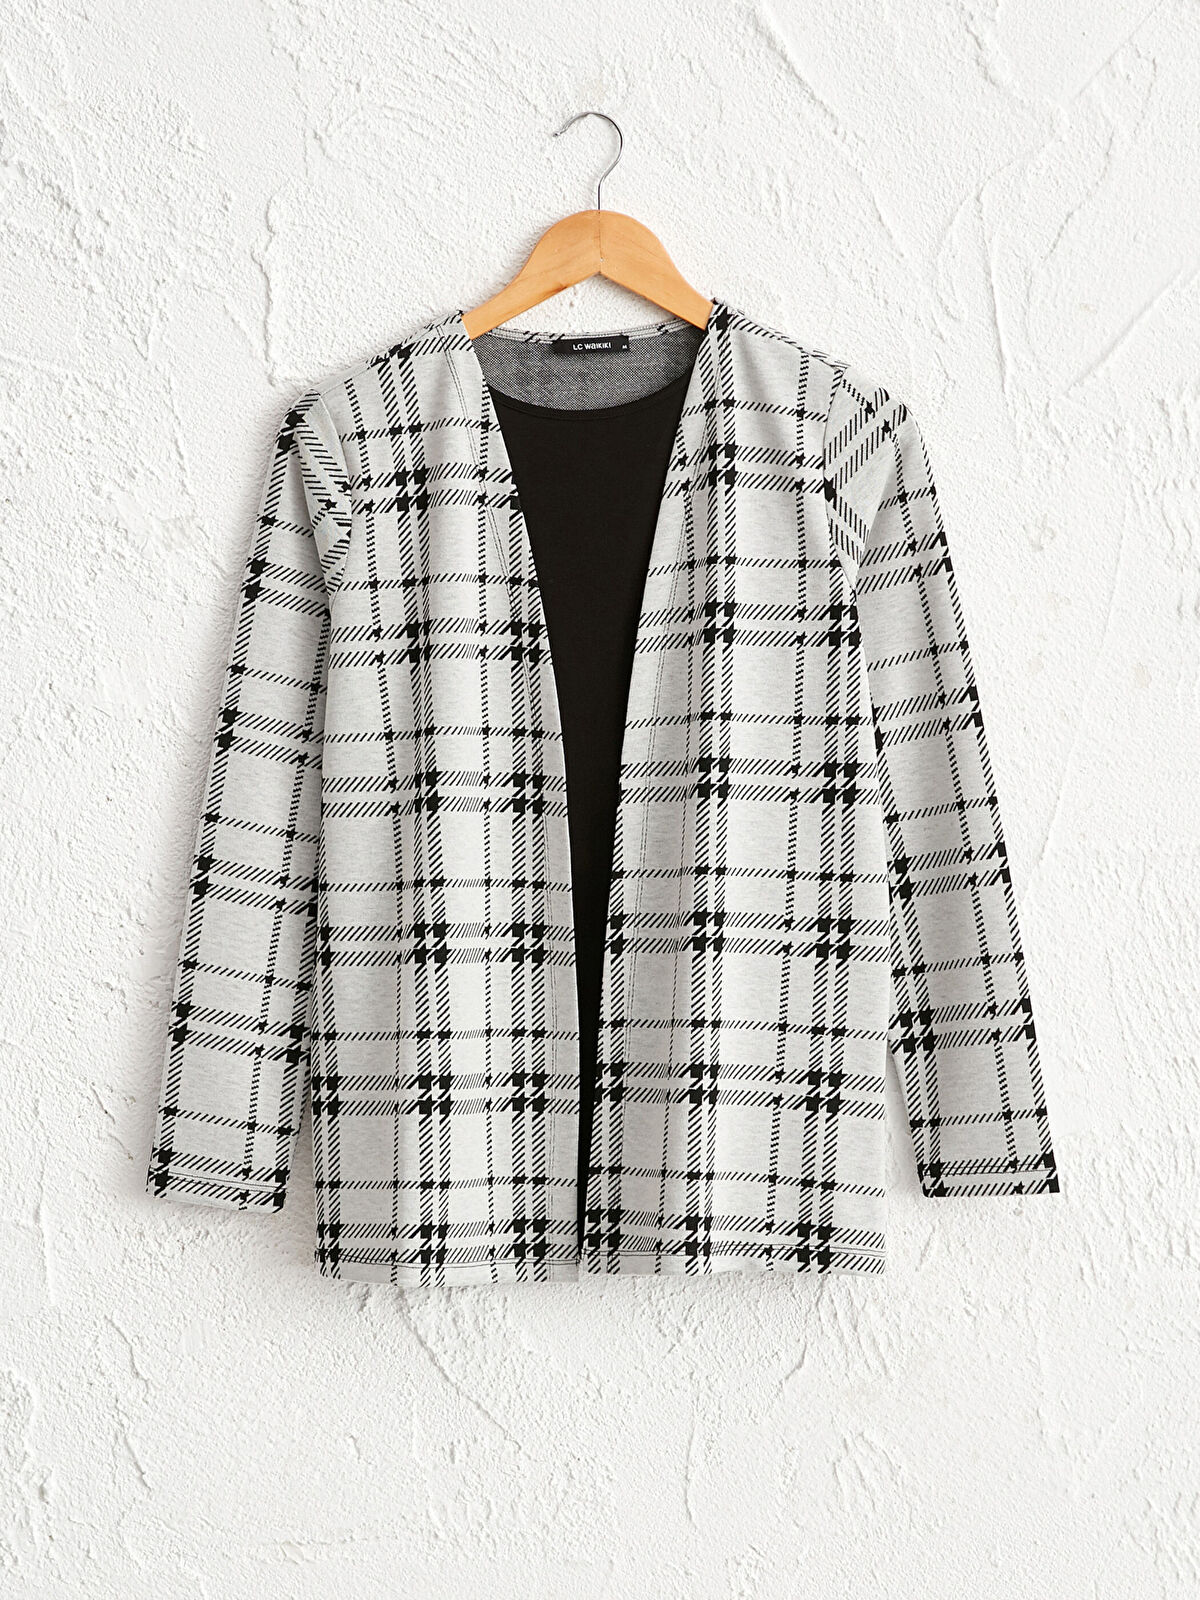 İçli Dışlı Tek Parça Bluz - LC WAIKIKI